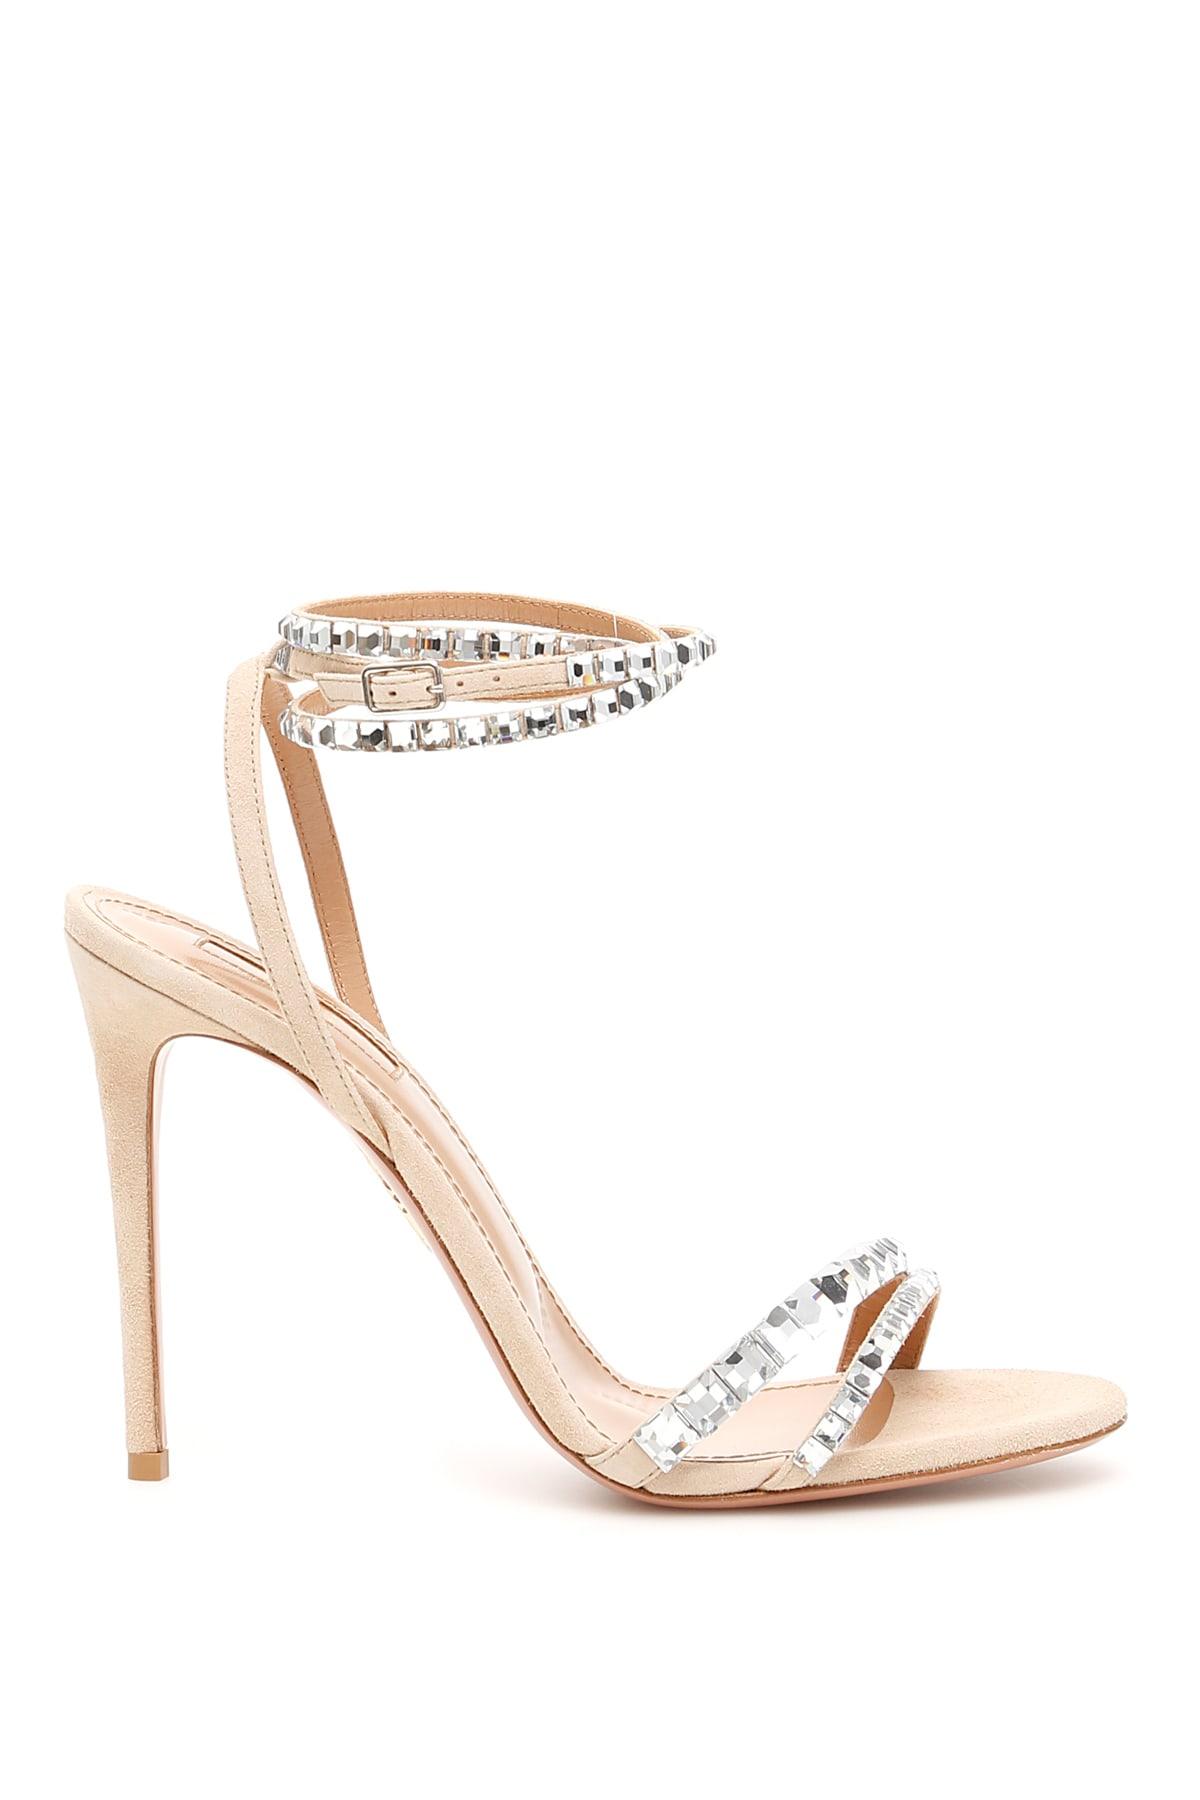 8b7bb8379 Aquazzura Aquazzura Vera 105 Sandals - NUDE (Beige) - 10987612 | italist